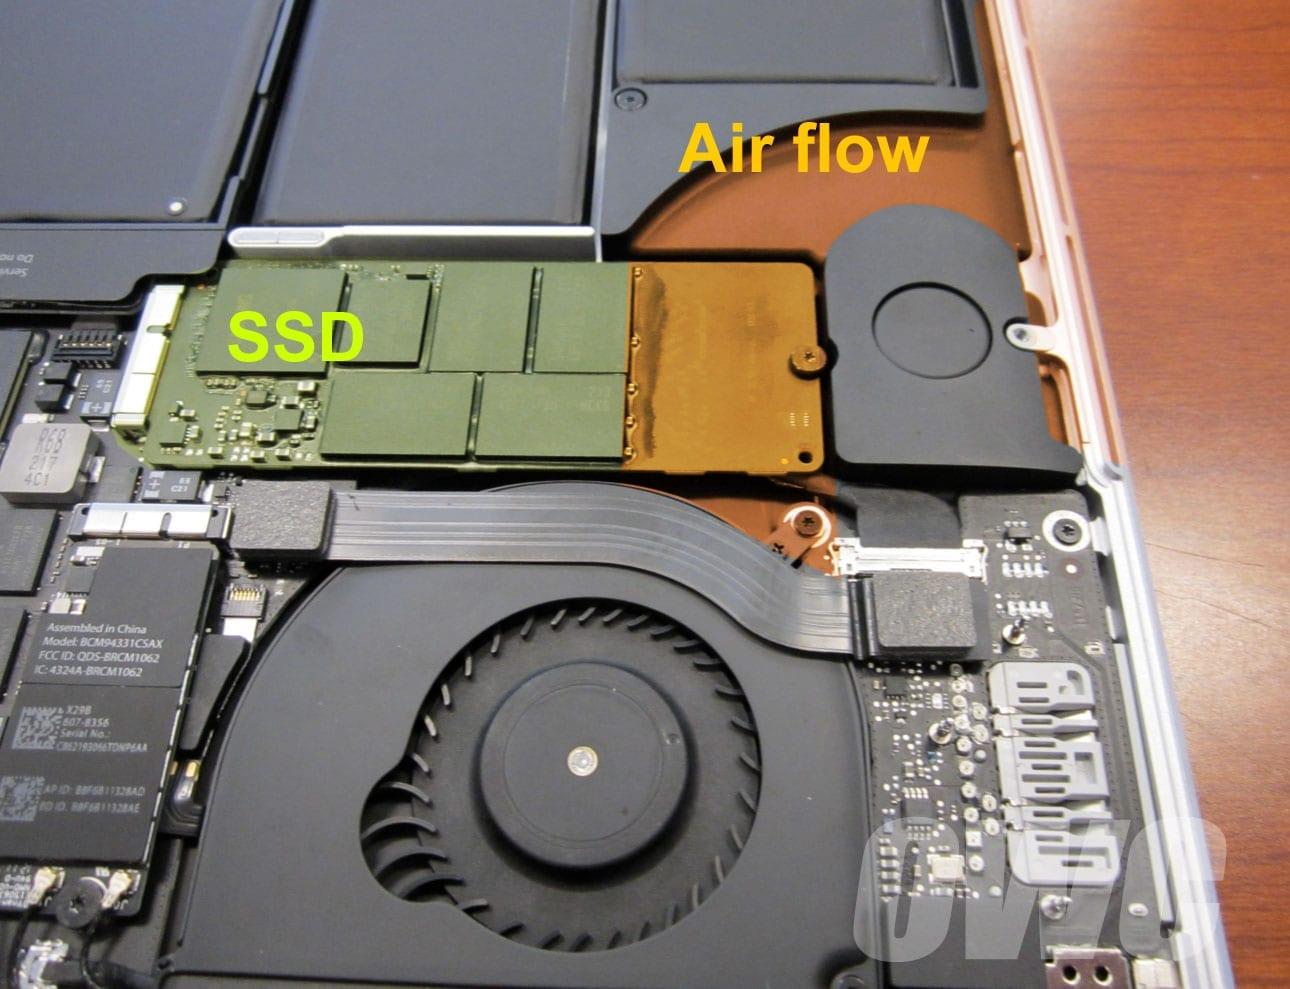 Was The 15 Inch Macbook Pro With Retina Display Originally